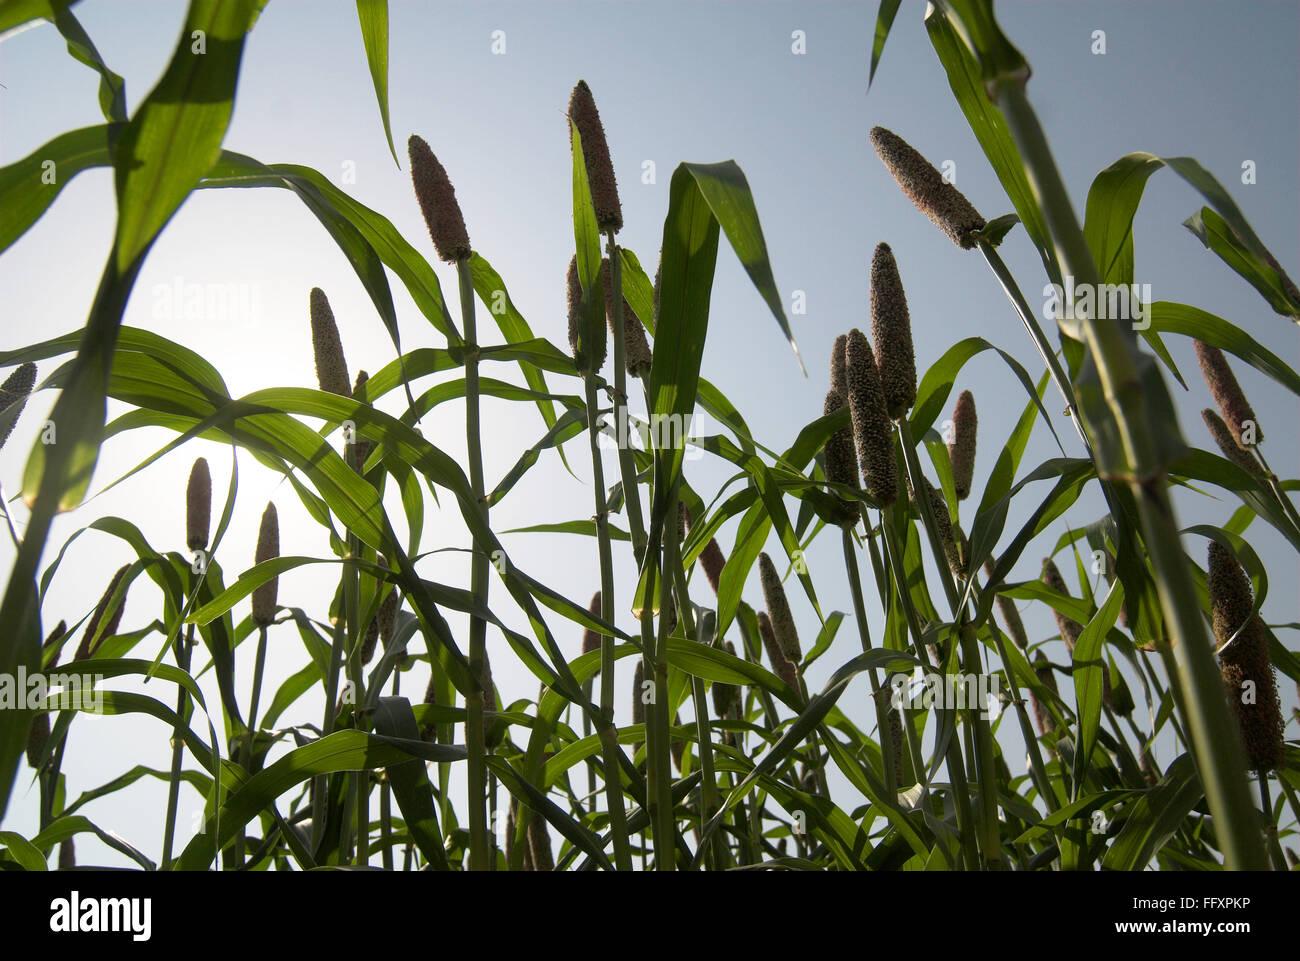 Pearl millet pennisetum glaucum field in Dimba village , District Pune , Maharashtra , India - Stock Image